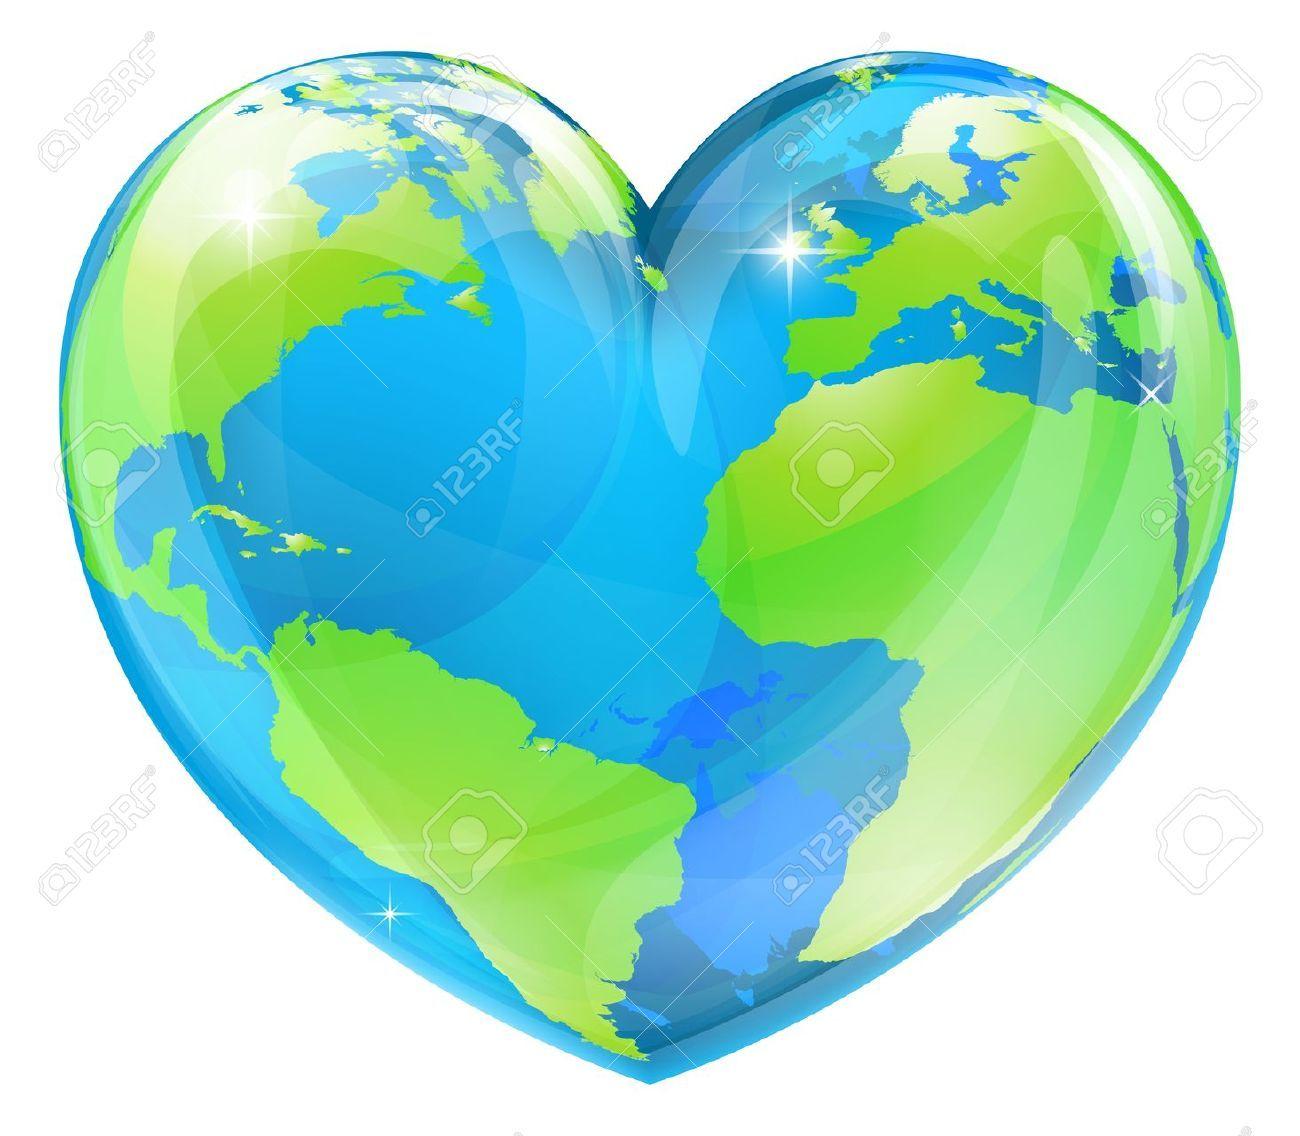 Heart Shaped World Map Clipart.